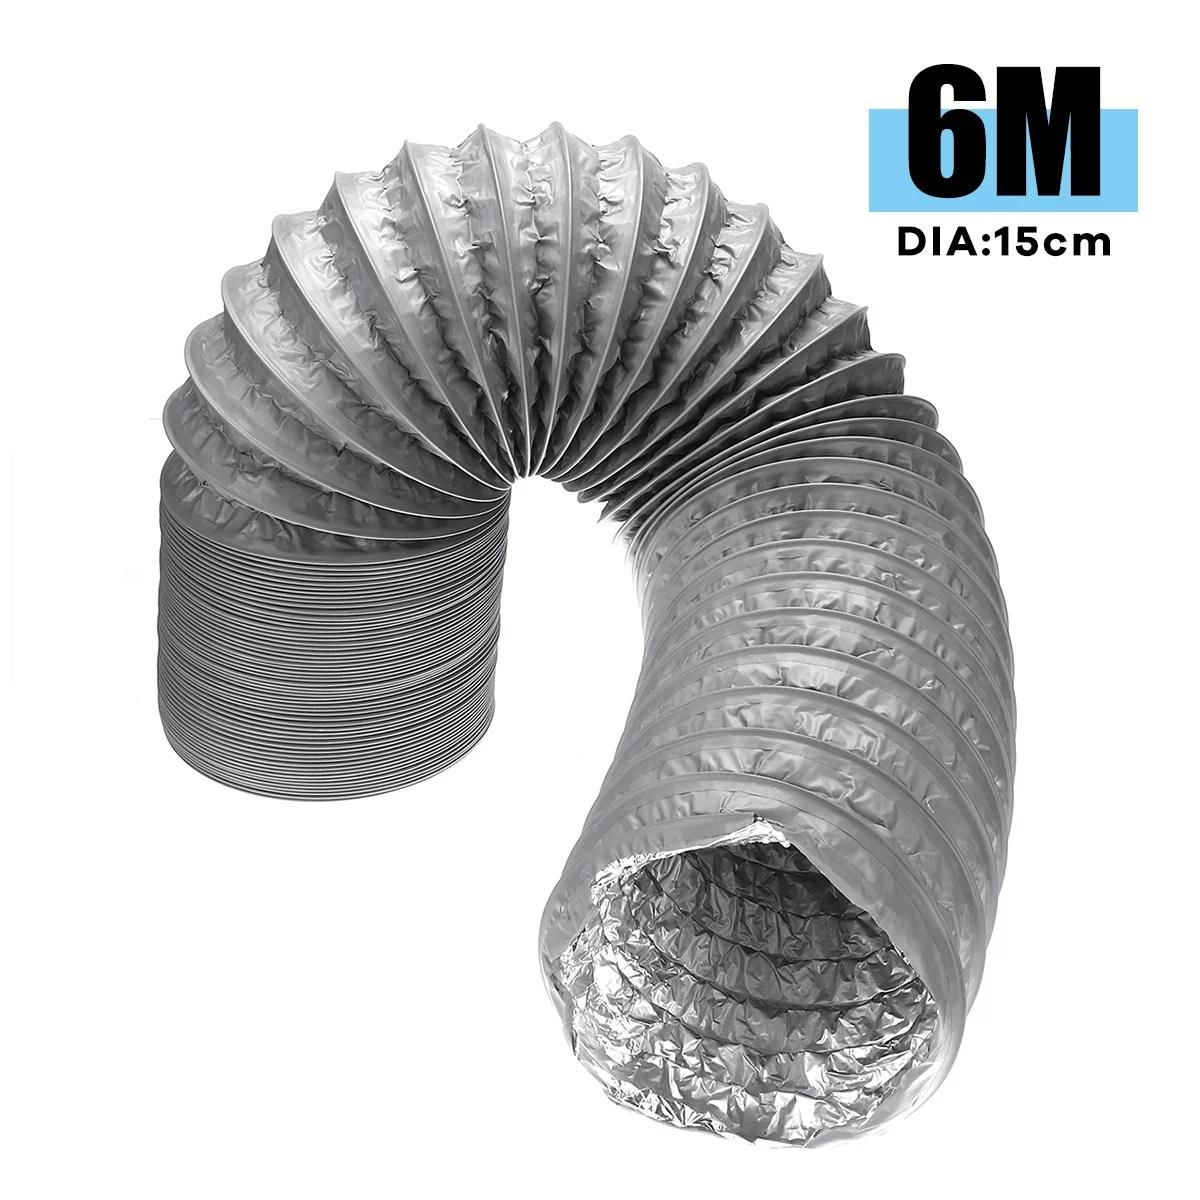 dia 15cm black 5ft 10ft 20ft flexible exhaust vent hose pipe ducting dryer vent hose pvc composite pipe for fresh air system